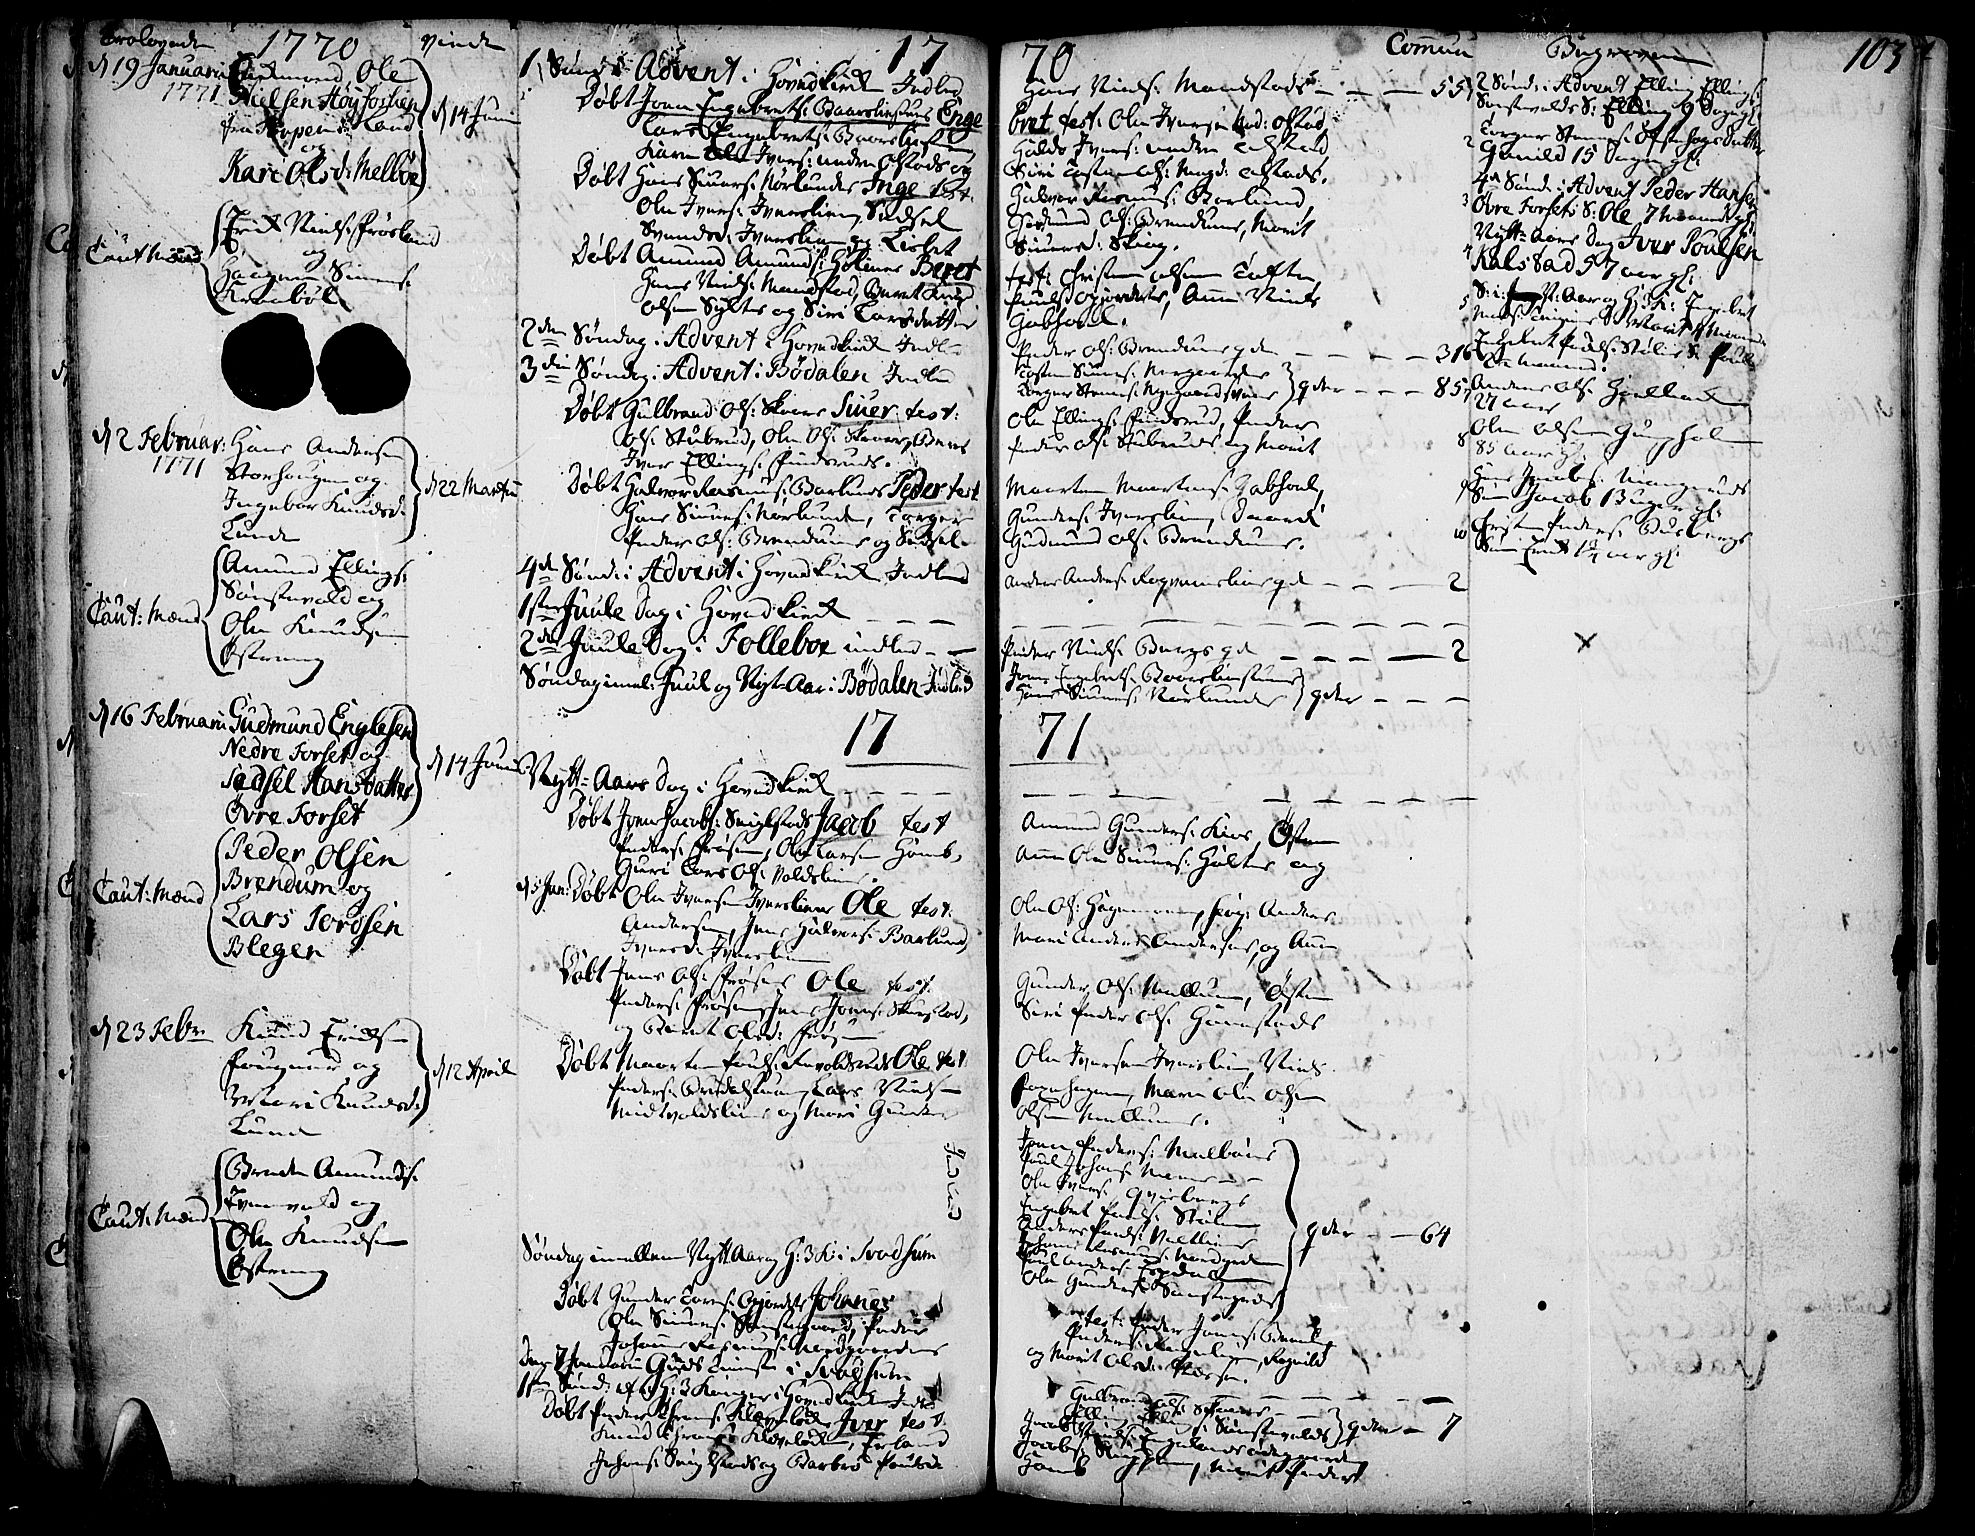 SAH, Gausdal prestekontor, Ministerialbok nr. 3, 1758-1809, s. 103